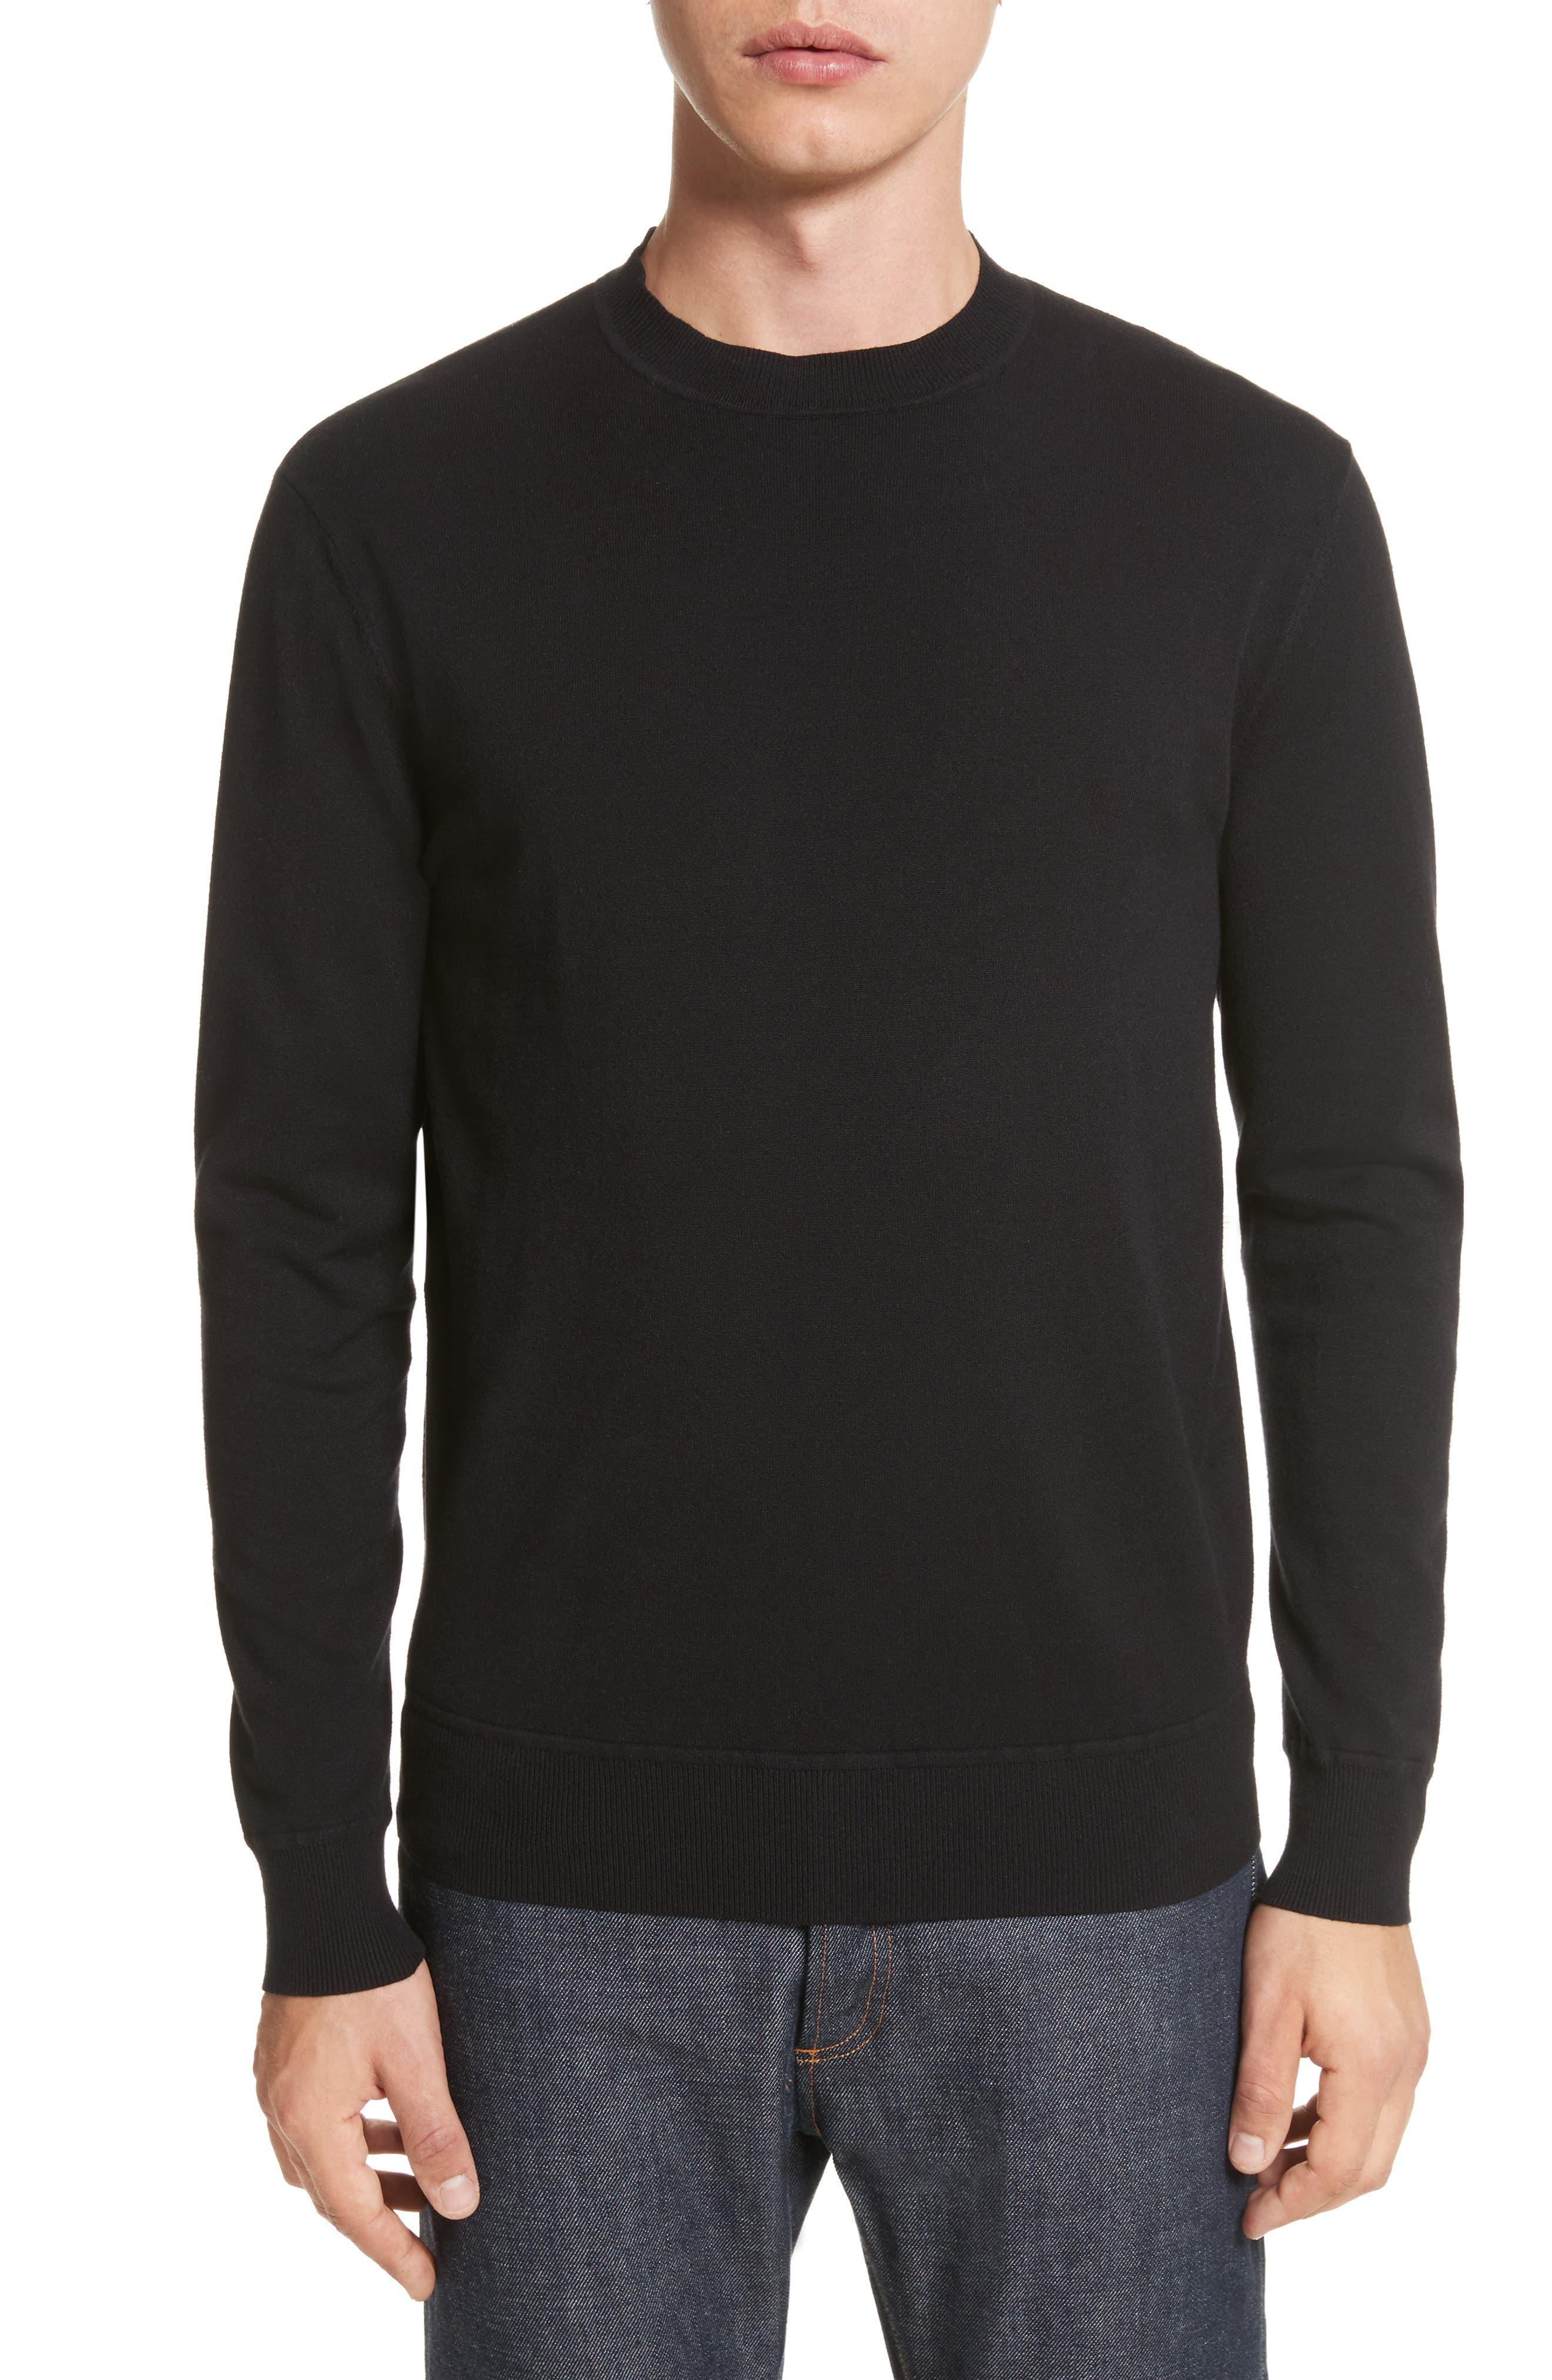 A.P.C. Ronnie Crewneck Sweatshirt